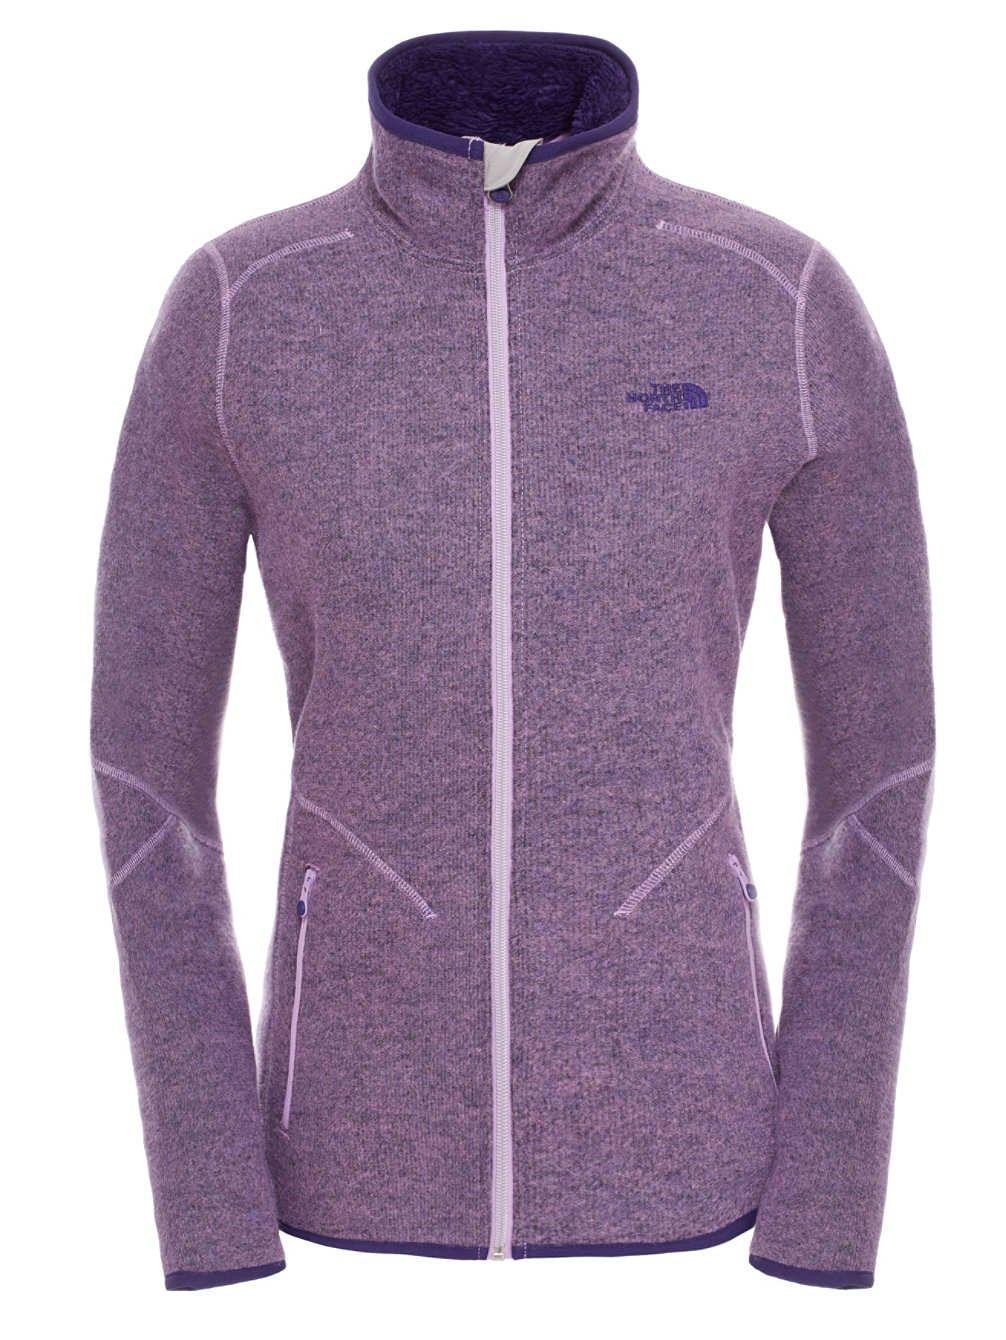 THE NORTH FACE Damen Jacke Zermatt Full Zip jetzt kaufen